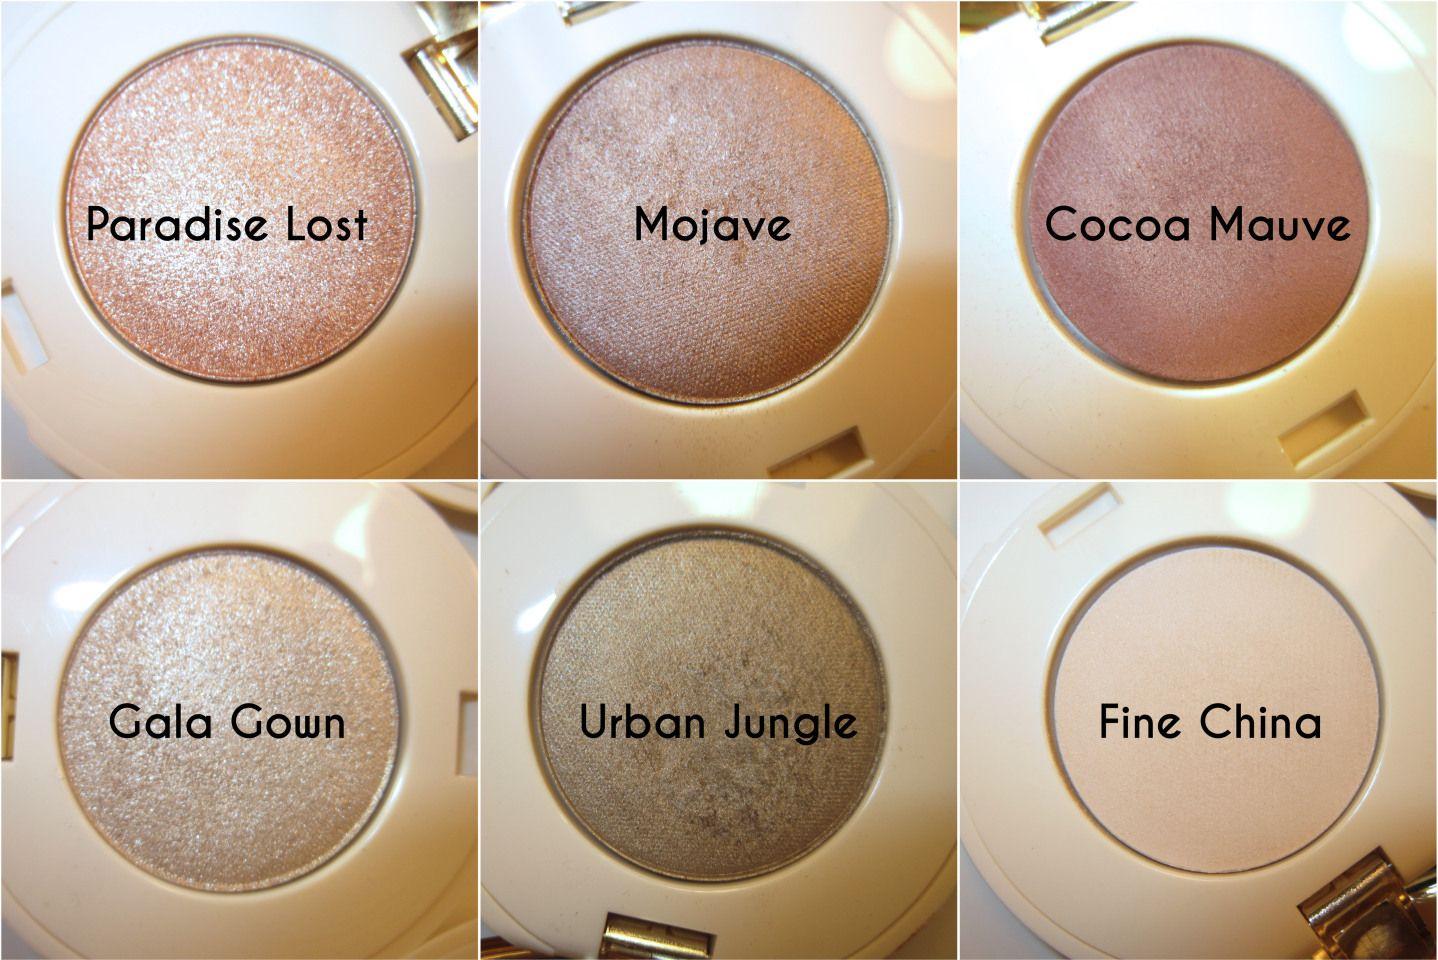 H&M Beauty eyeshadows: Paradise Lost, Mojave, Cocoa Mauve, Gala Gown, Urban Jungle, Fine China